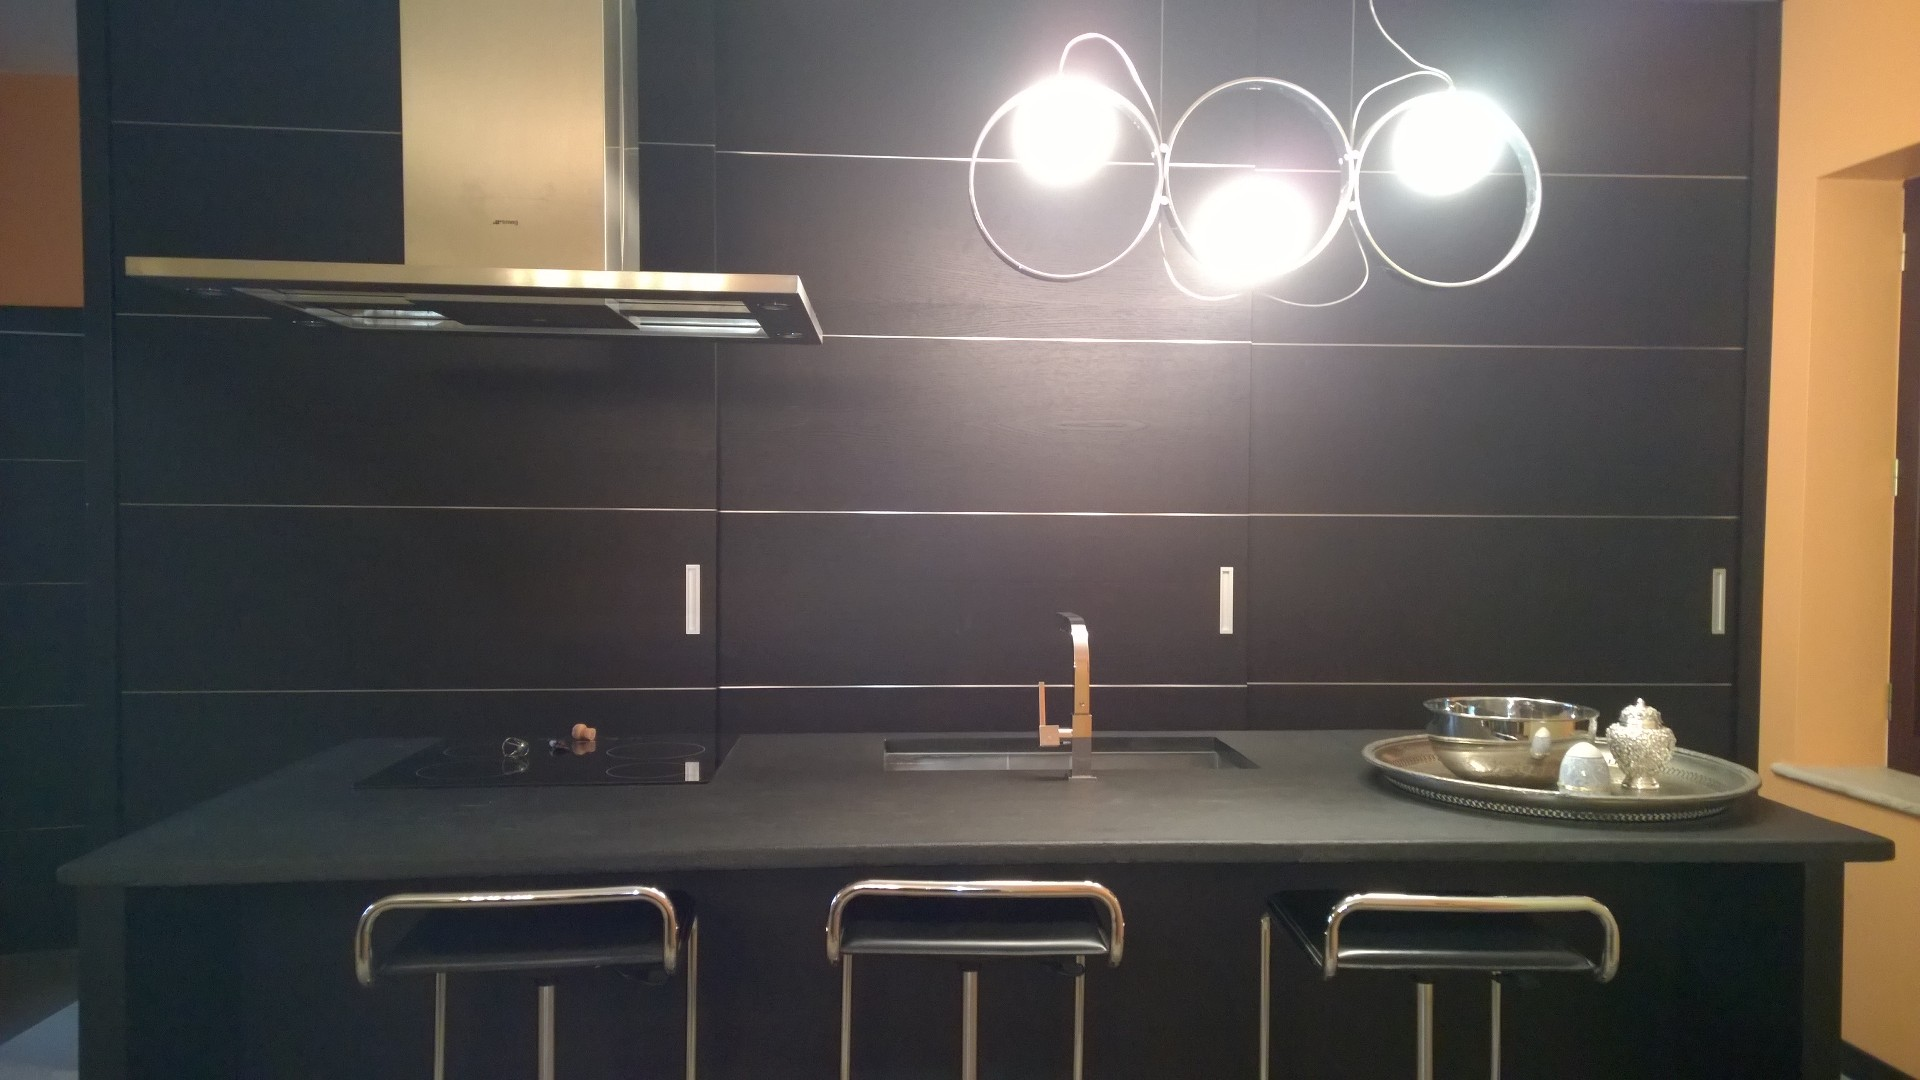 Cucina In Stile Moderno Photo Gallery Artarredo